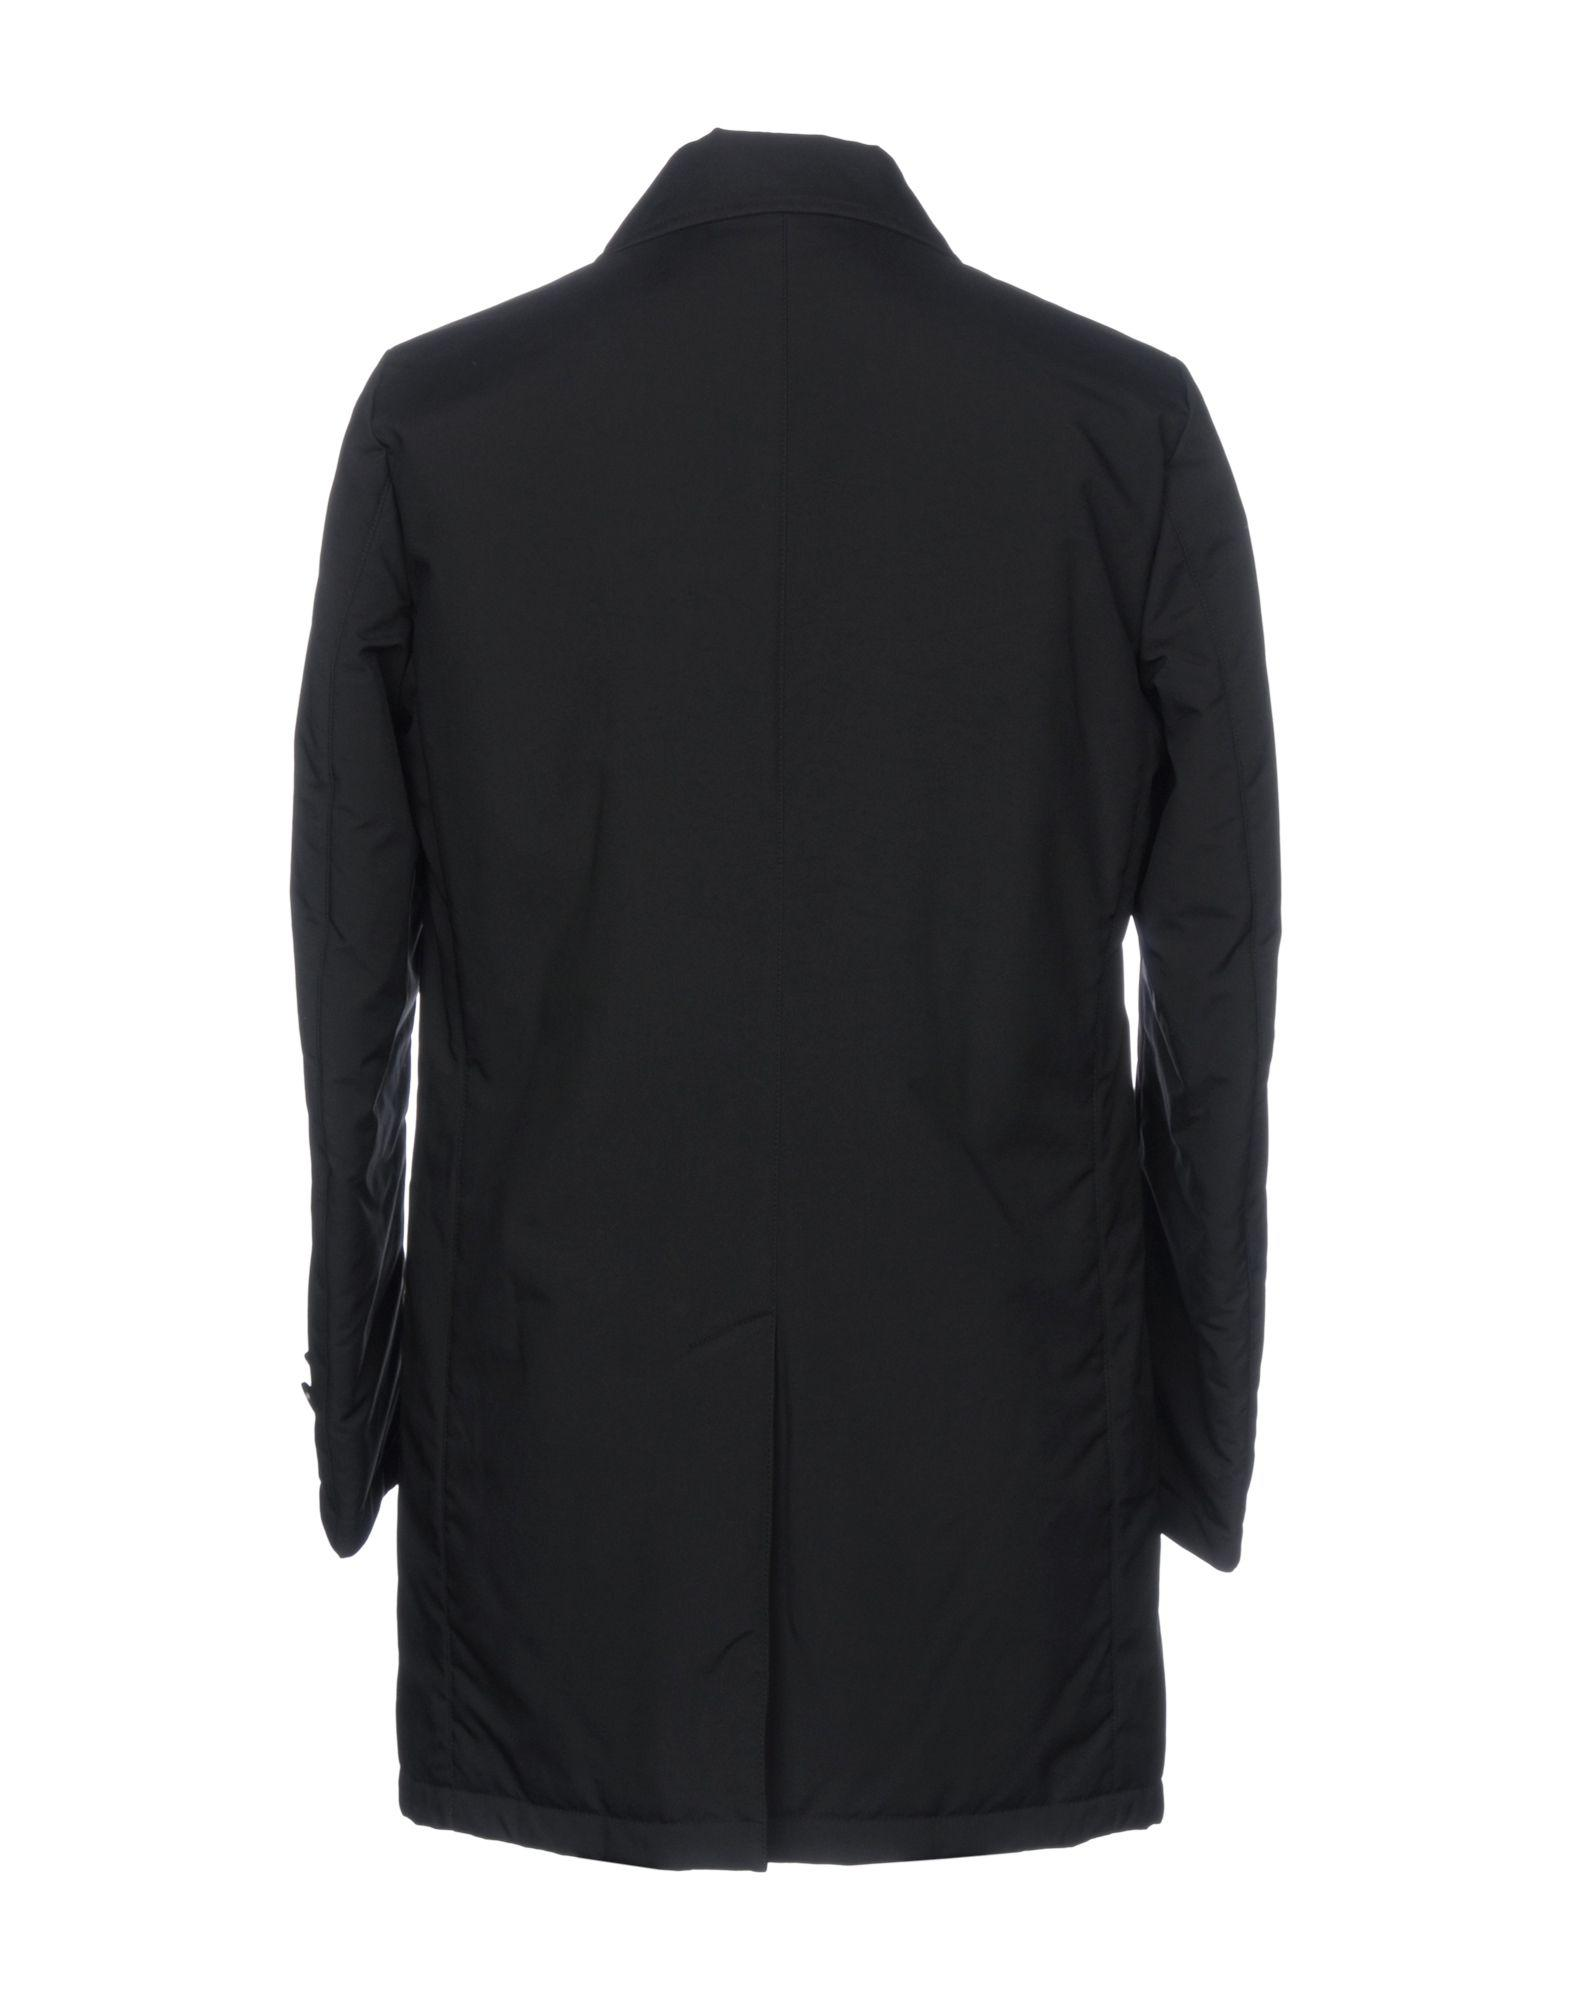 Pal Zileri Synthetic Jacket in Steel Grey (Grey) for Men